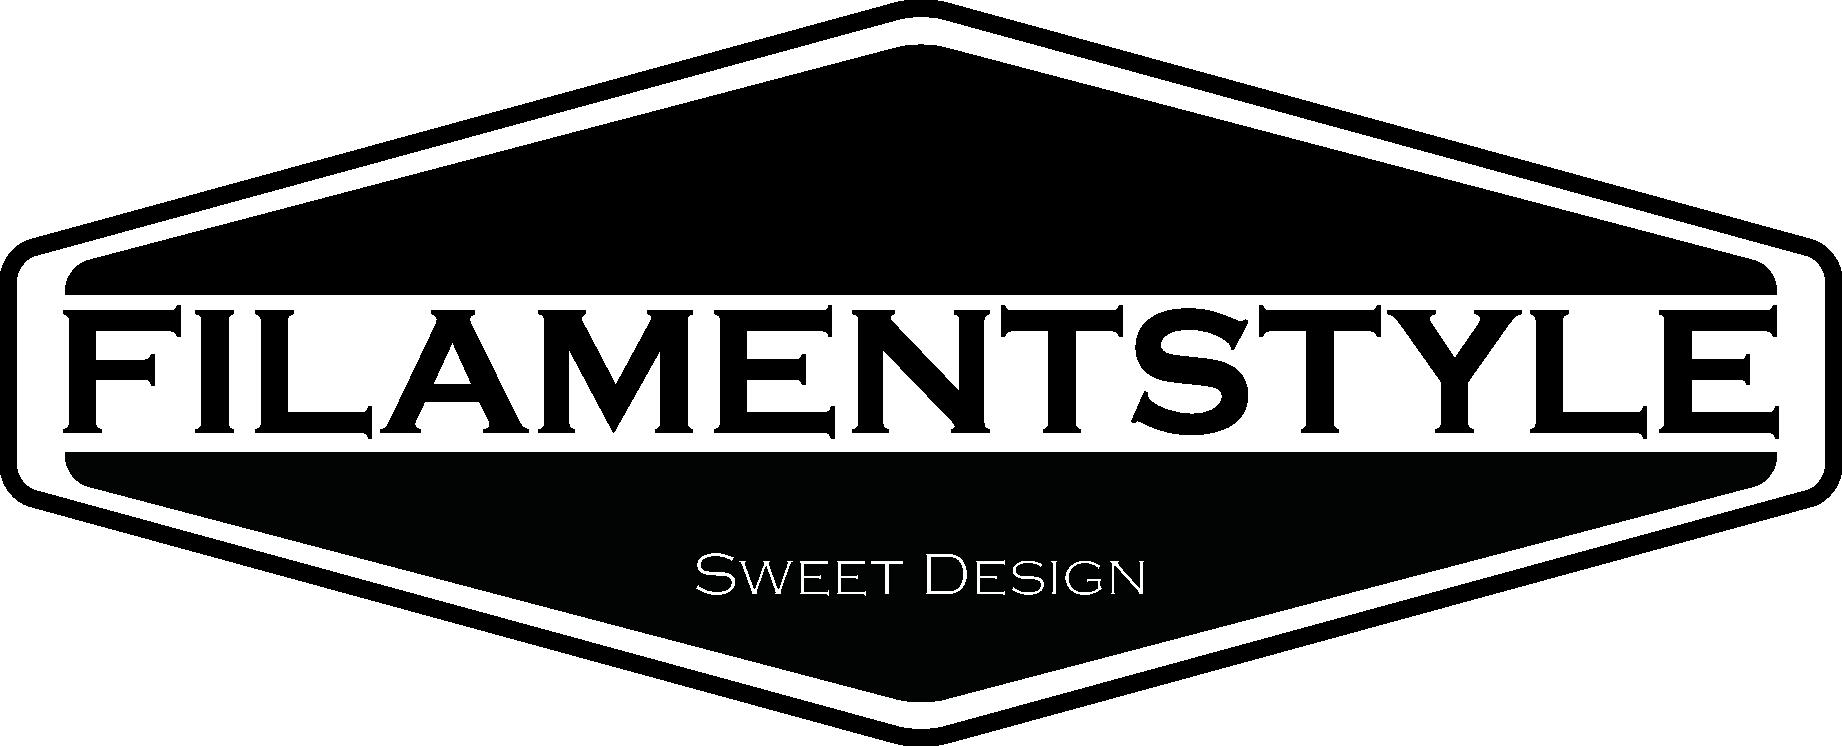 Chargement image